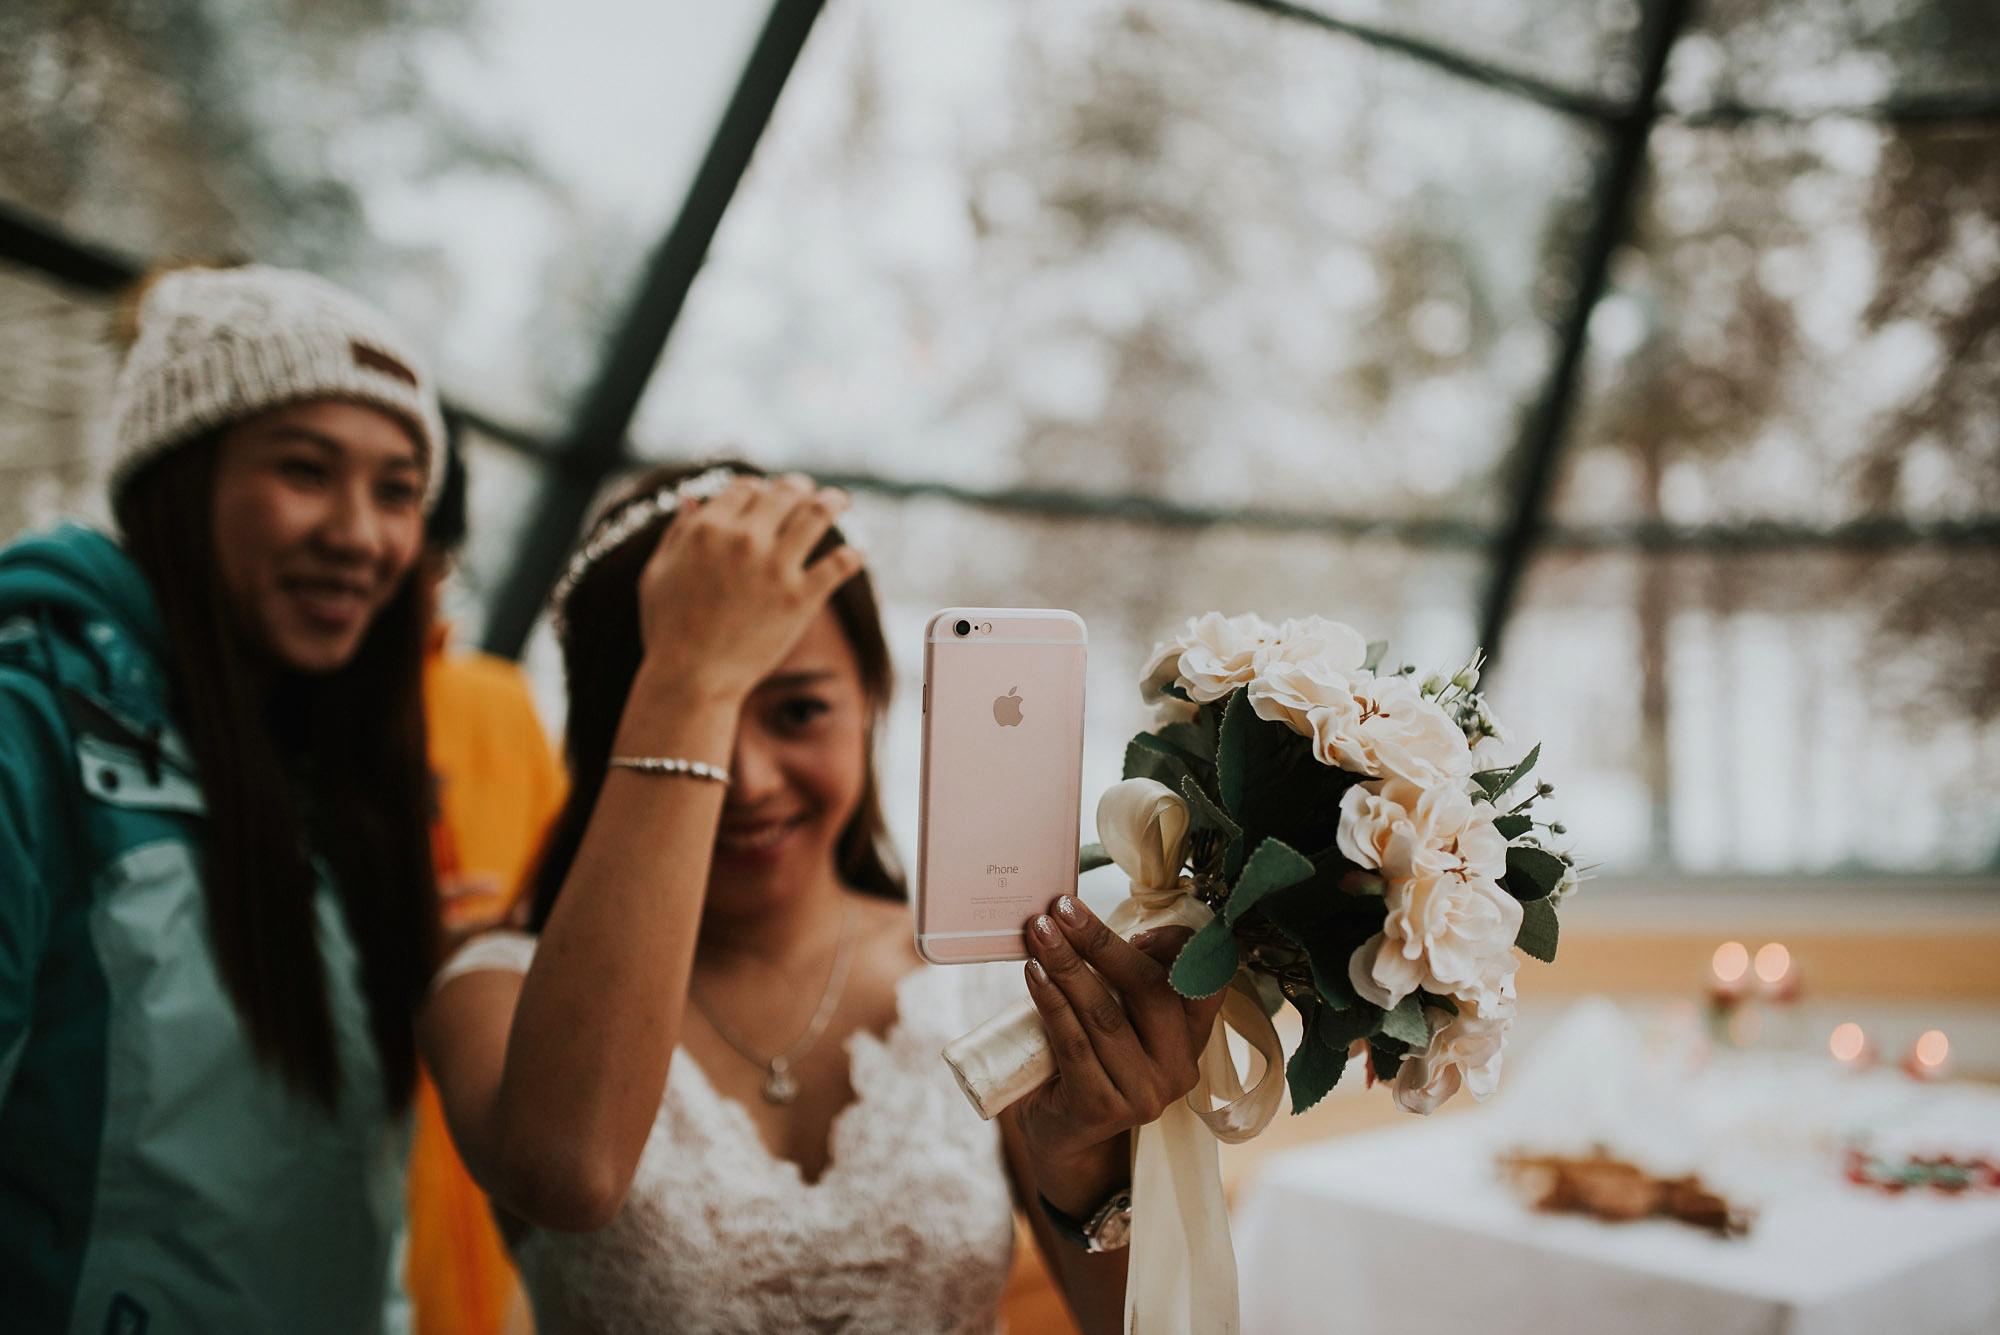 levi-ice-chapel-weddings-lapland-finland-photographer-jere-satamo-013-blog.jpg